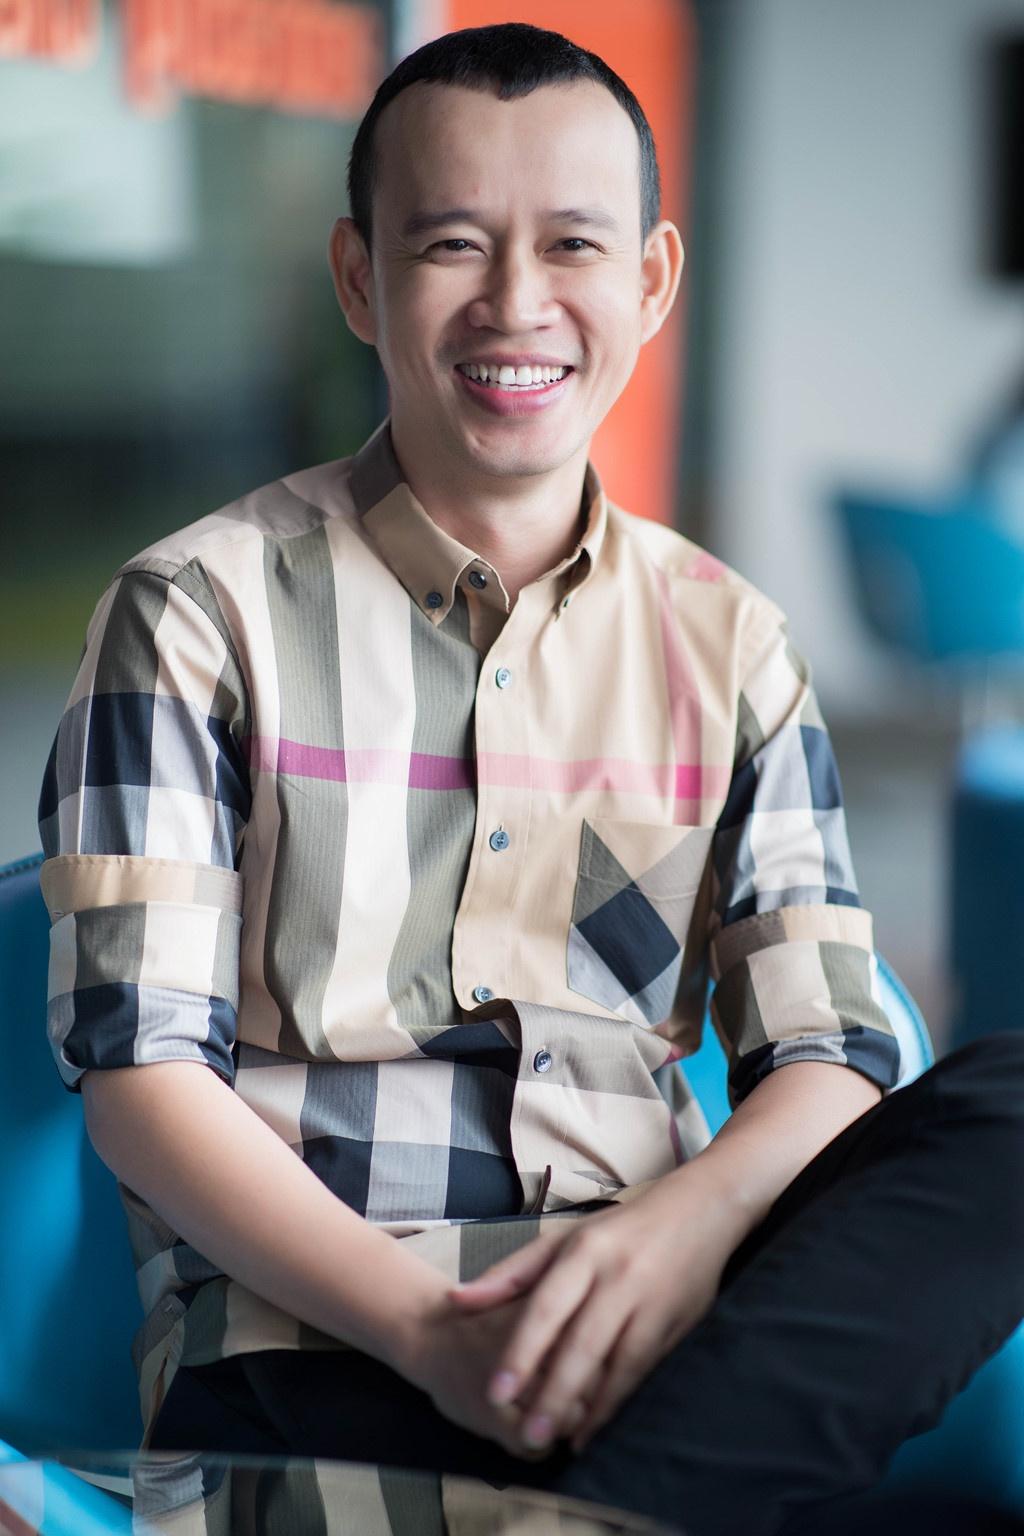 Ly do Hoang Thuy dung chan o top 20 Hoa hau Hoan vu The gioi hinh anh 3